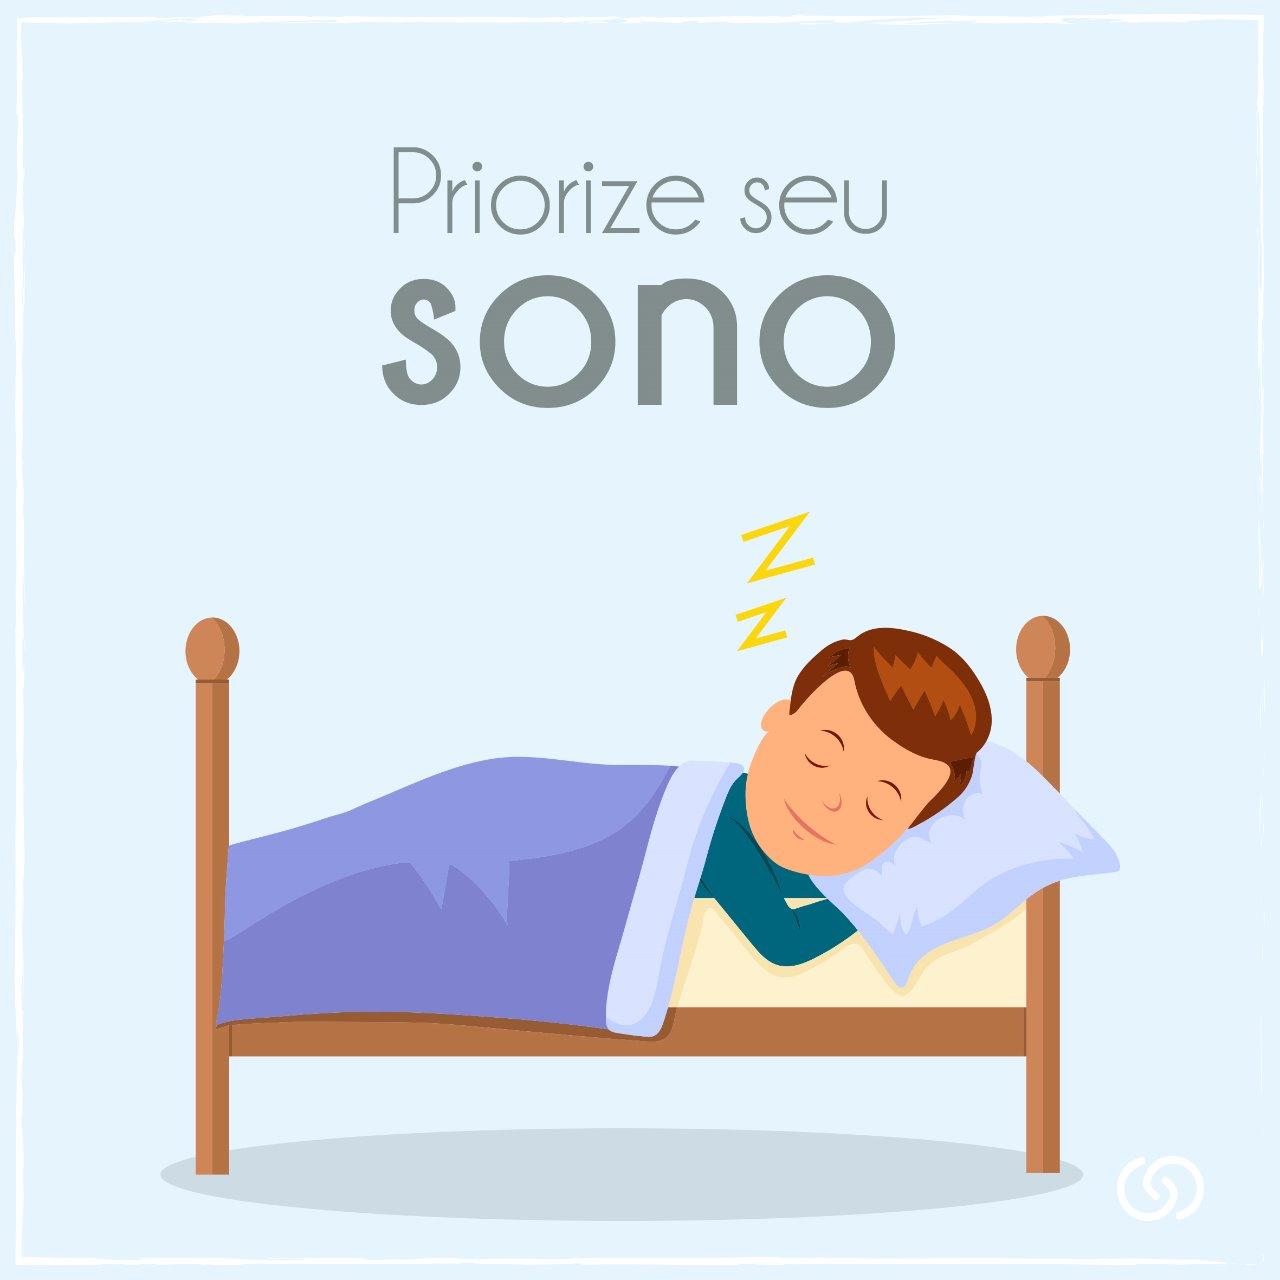 Priorize o seu sono